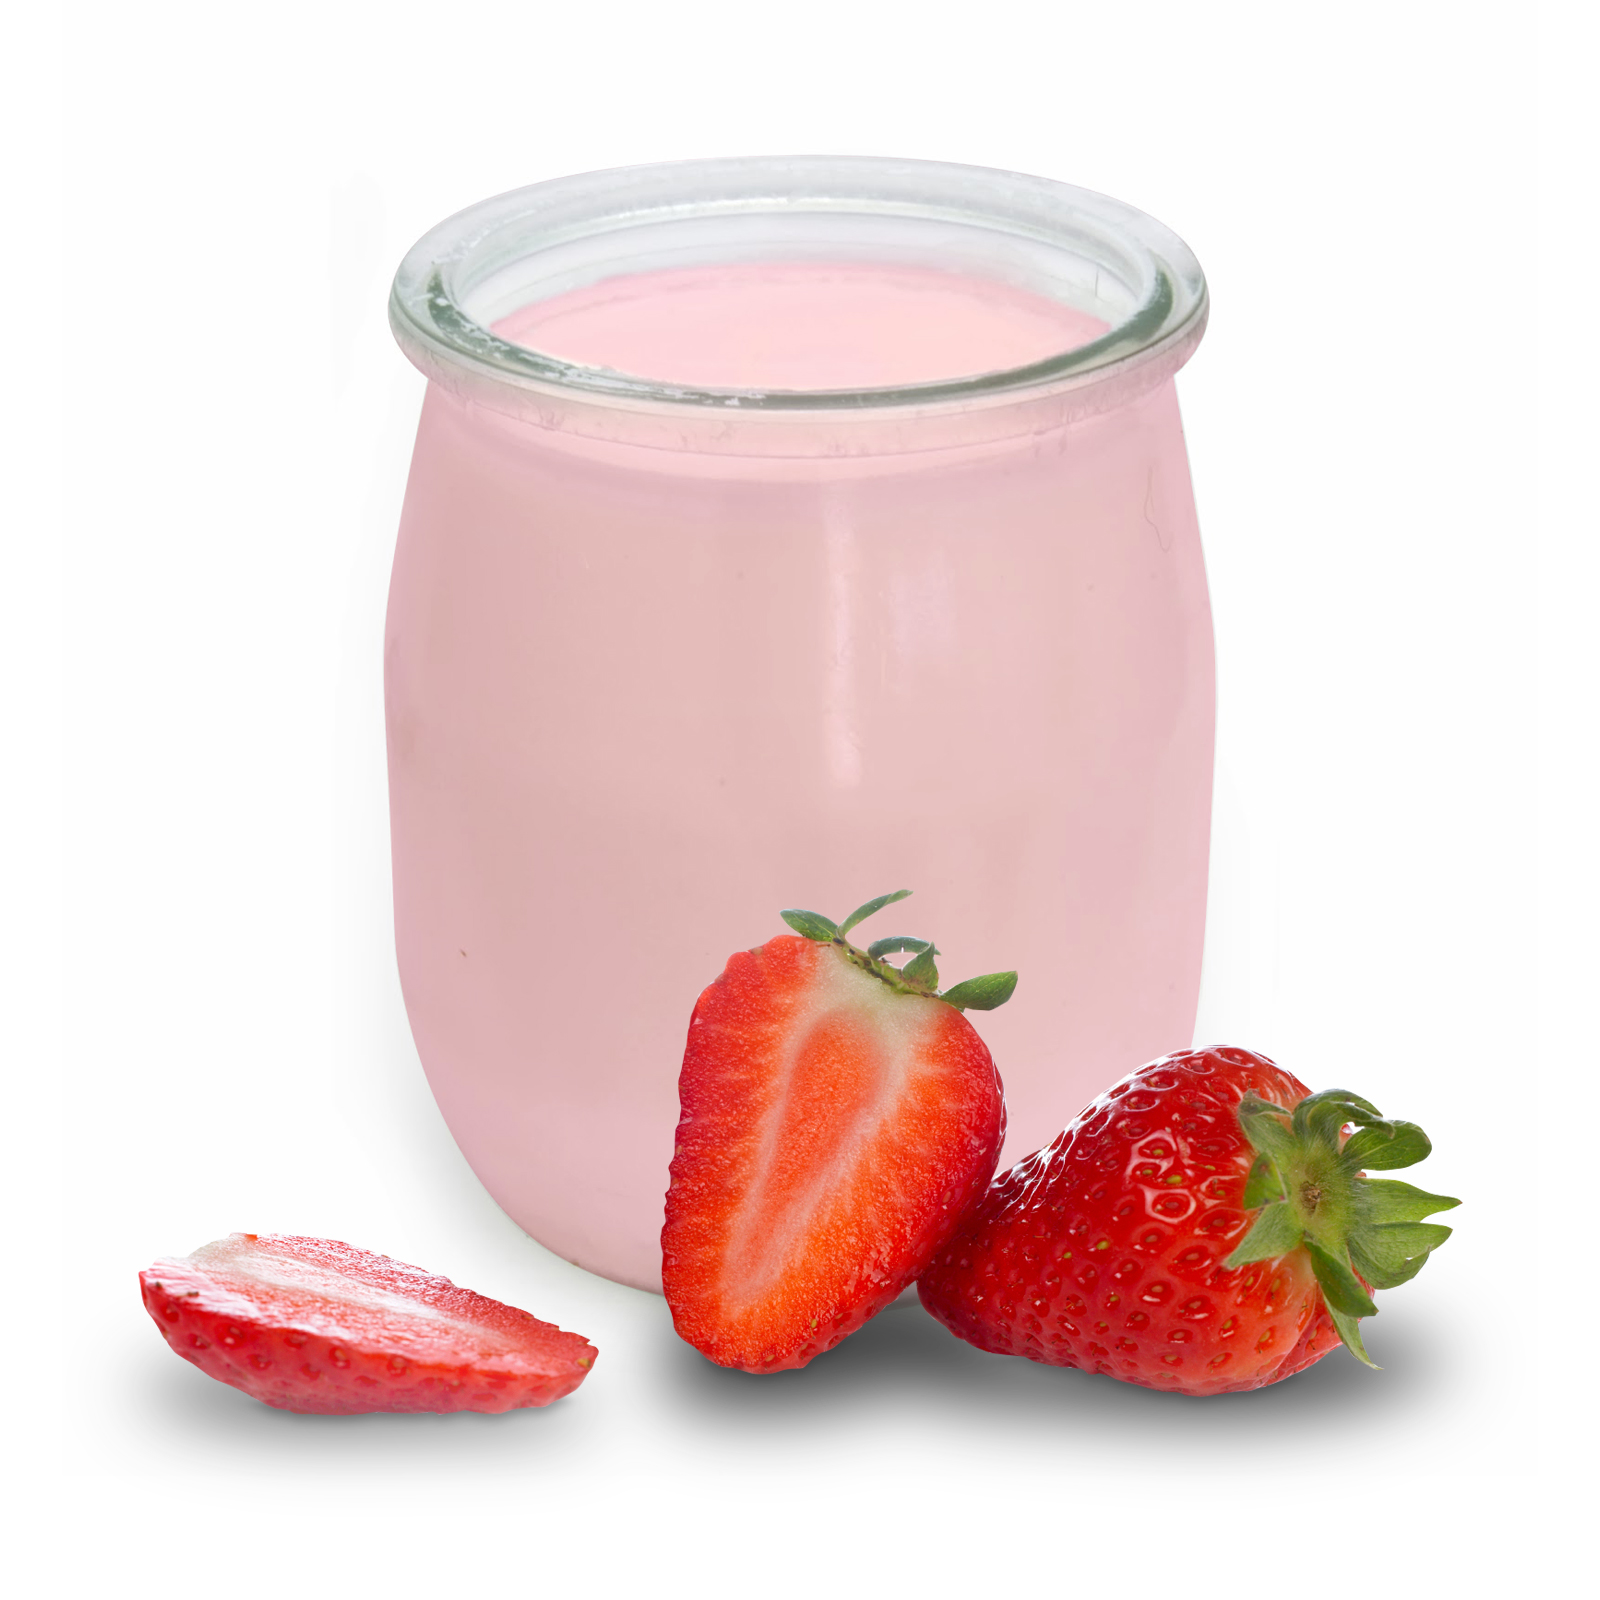 iron works arome fraise yogurt